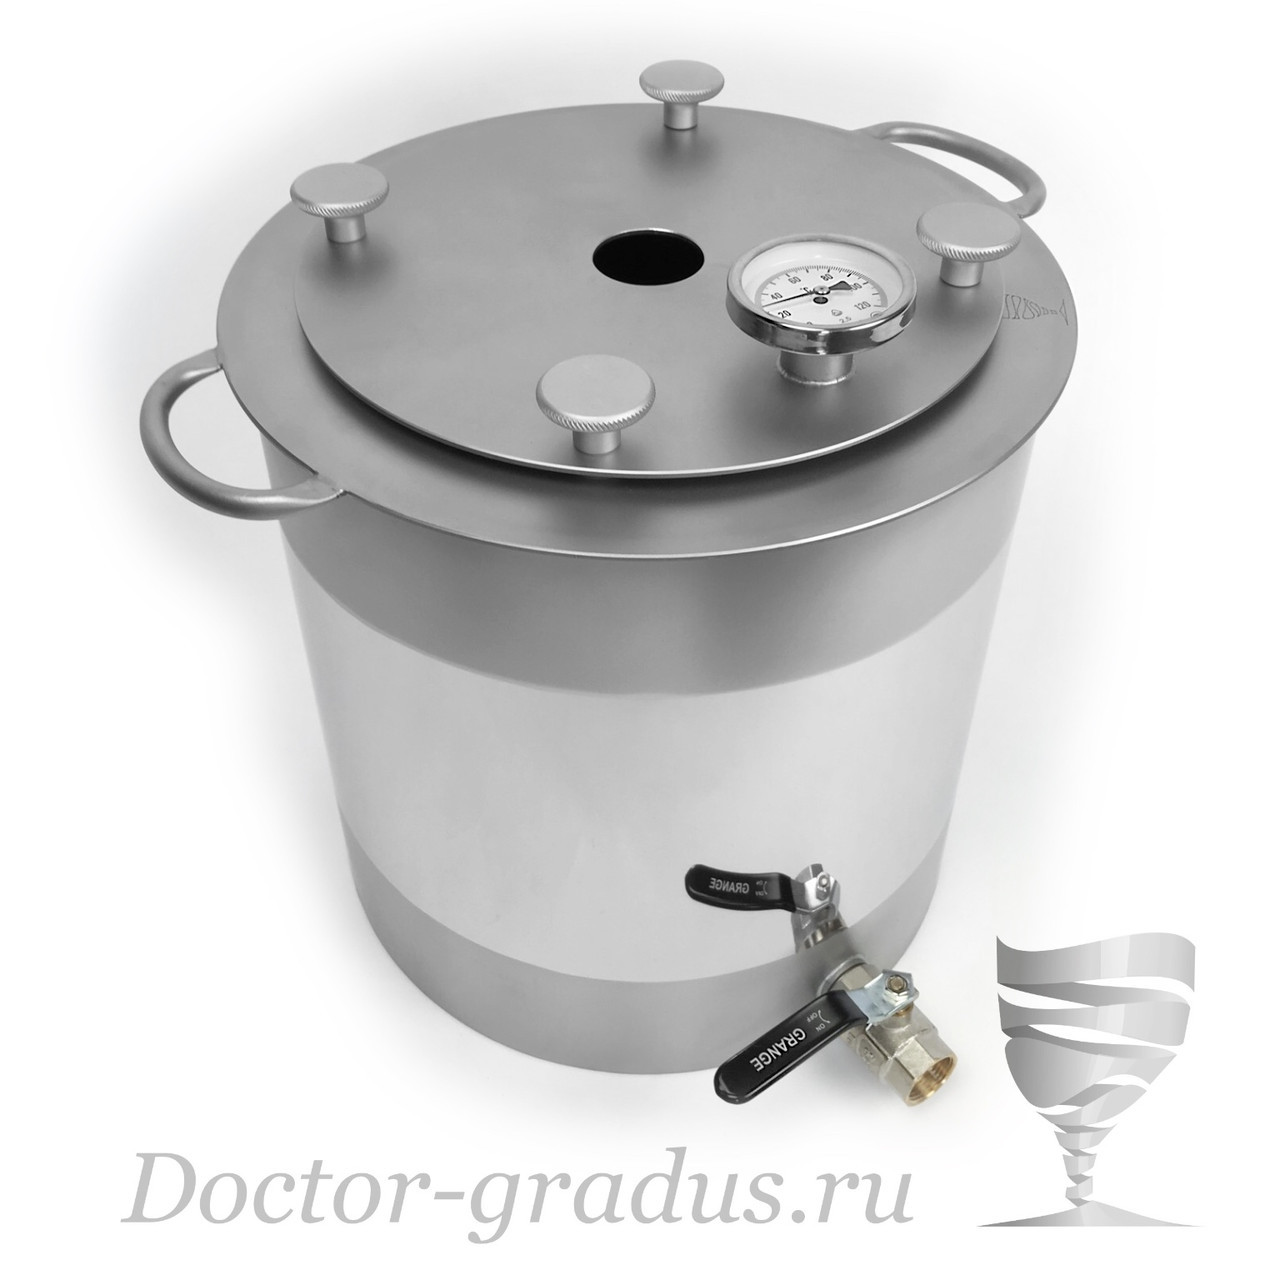 Куб ДГ на 25 литров, фото 1